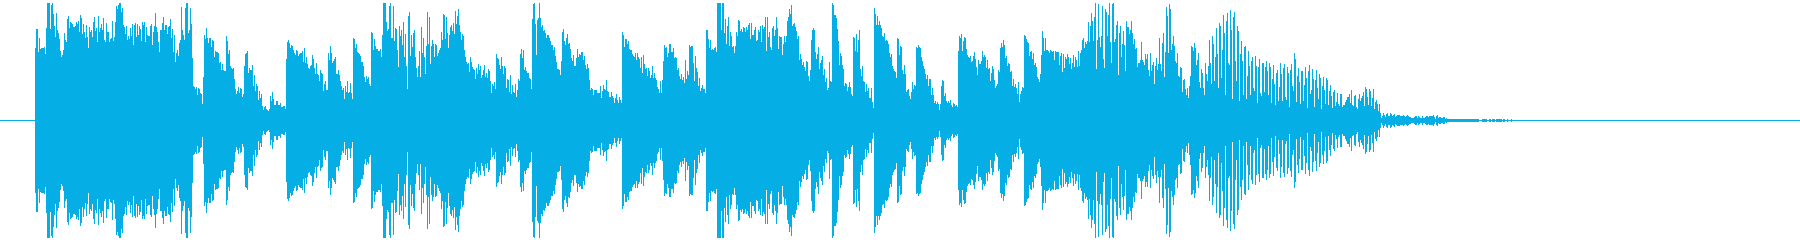 DJ効果音の再生済みの波形